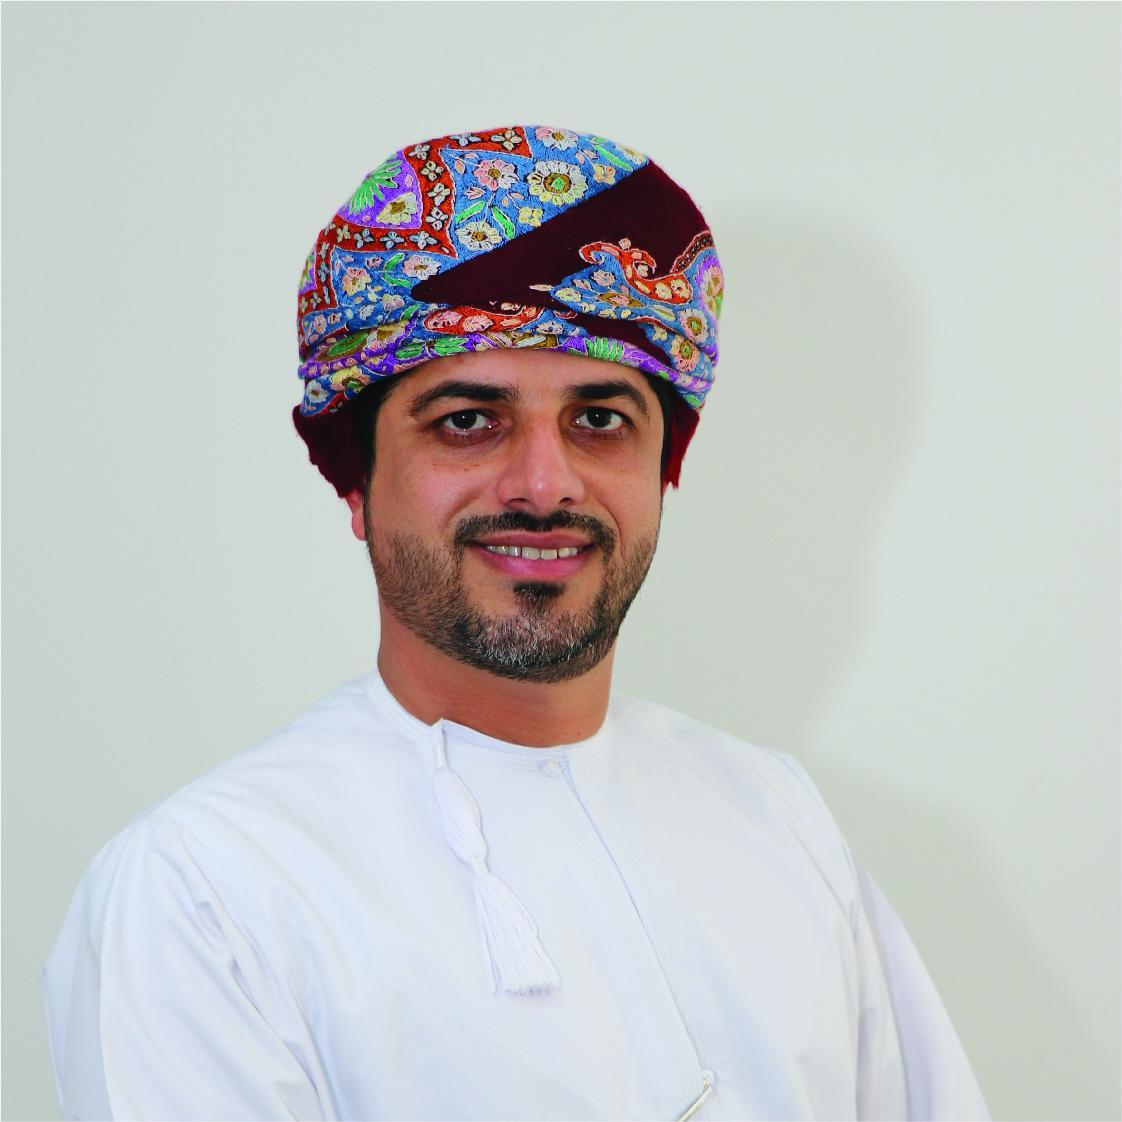 Mohammed Al Mawali